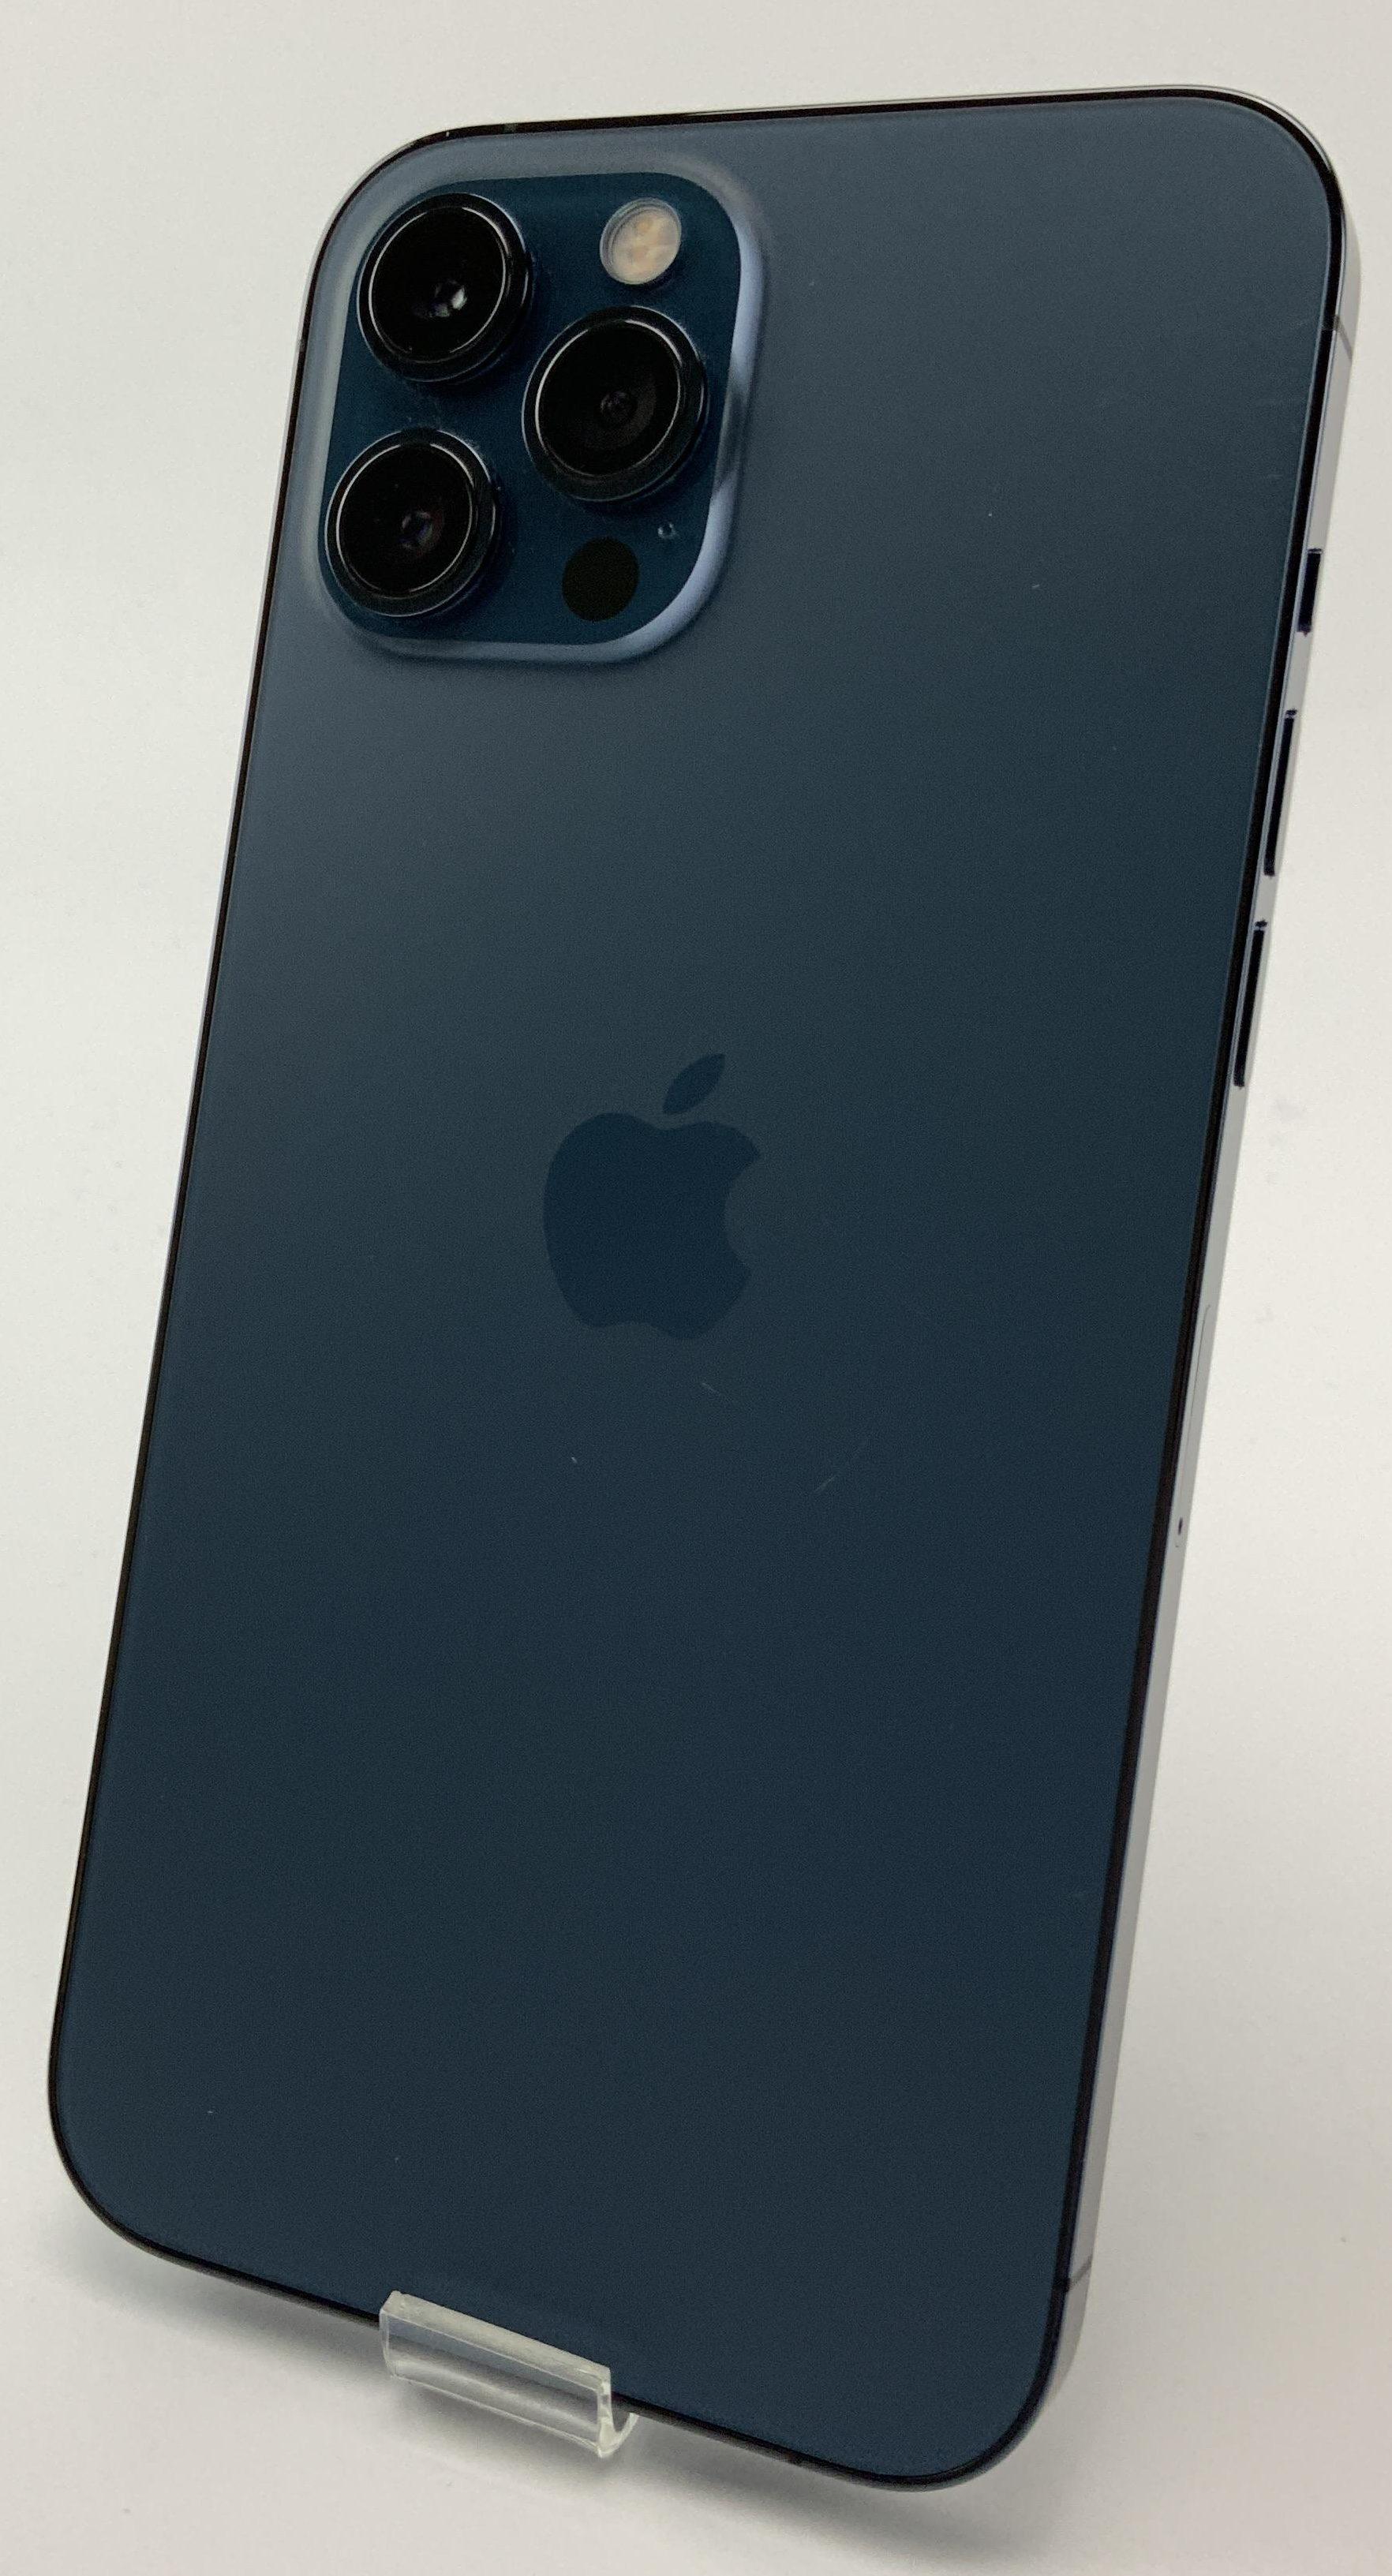 iPhone 12 Pro Max 512GB, 512GB, Pacific Blue, obraz 2